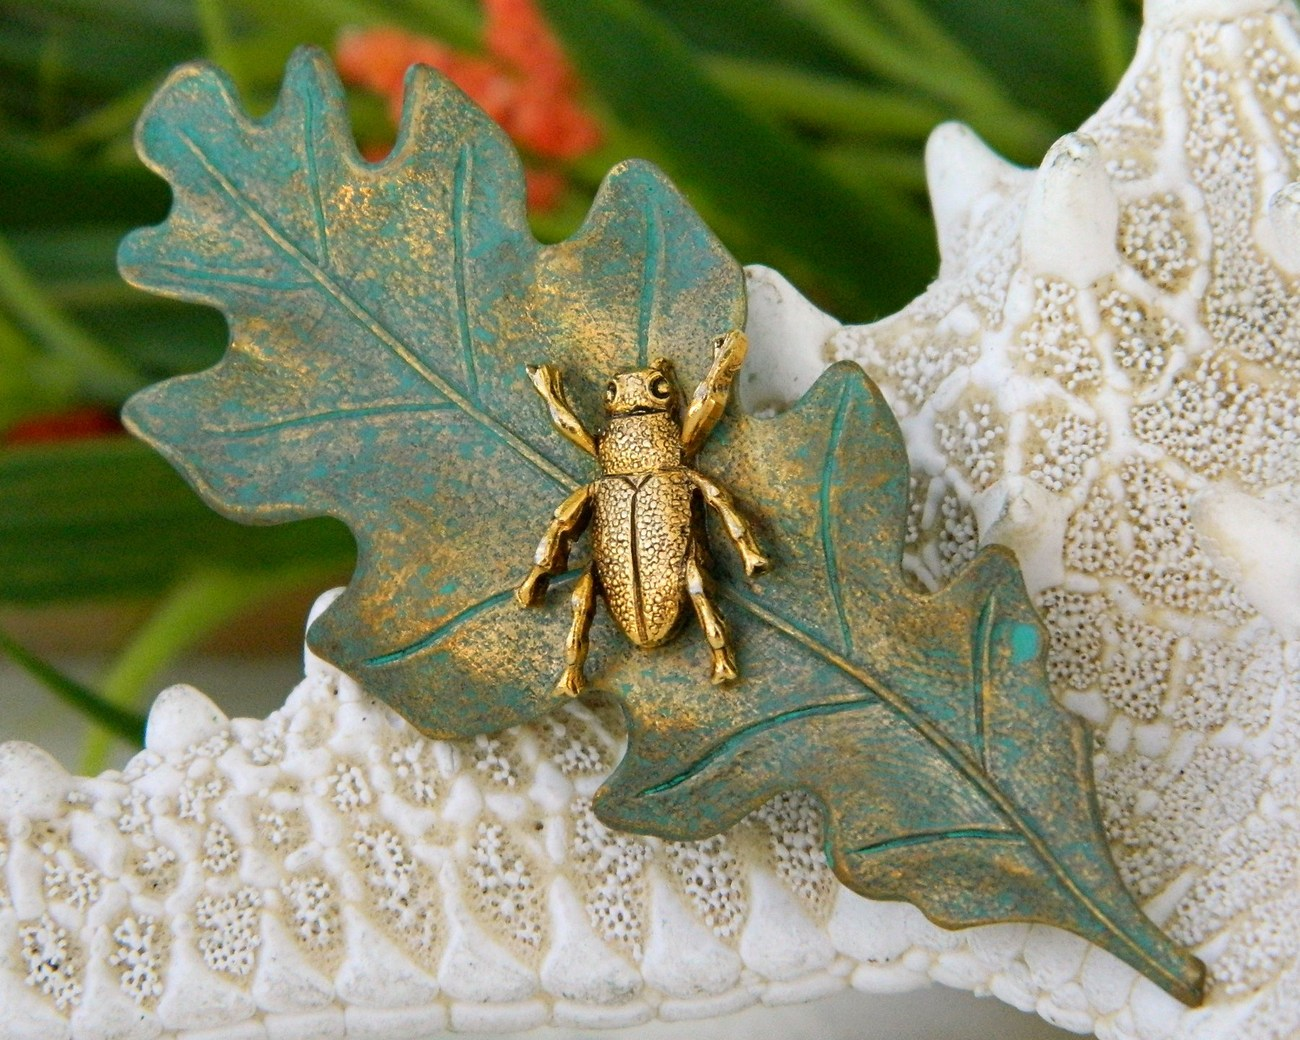 Beetle insect bug brooch pin oak leaf green gold figural